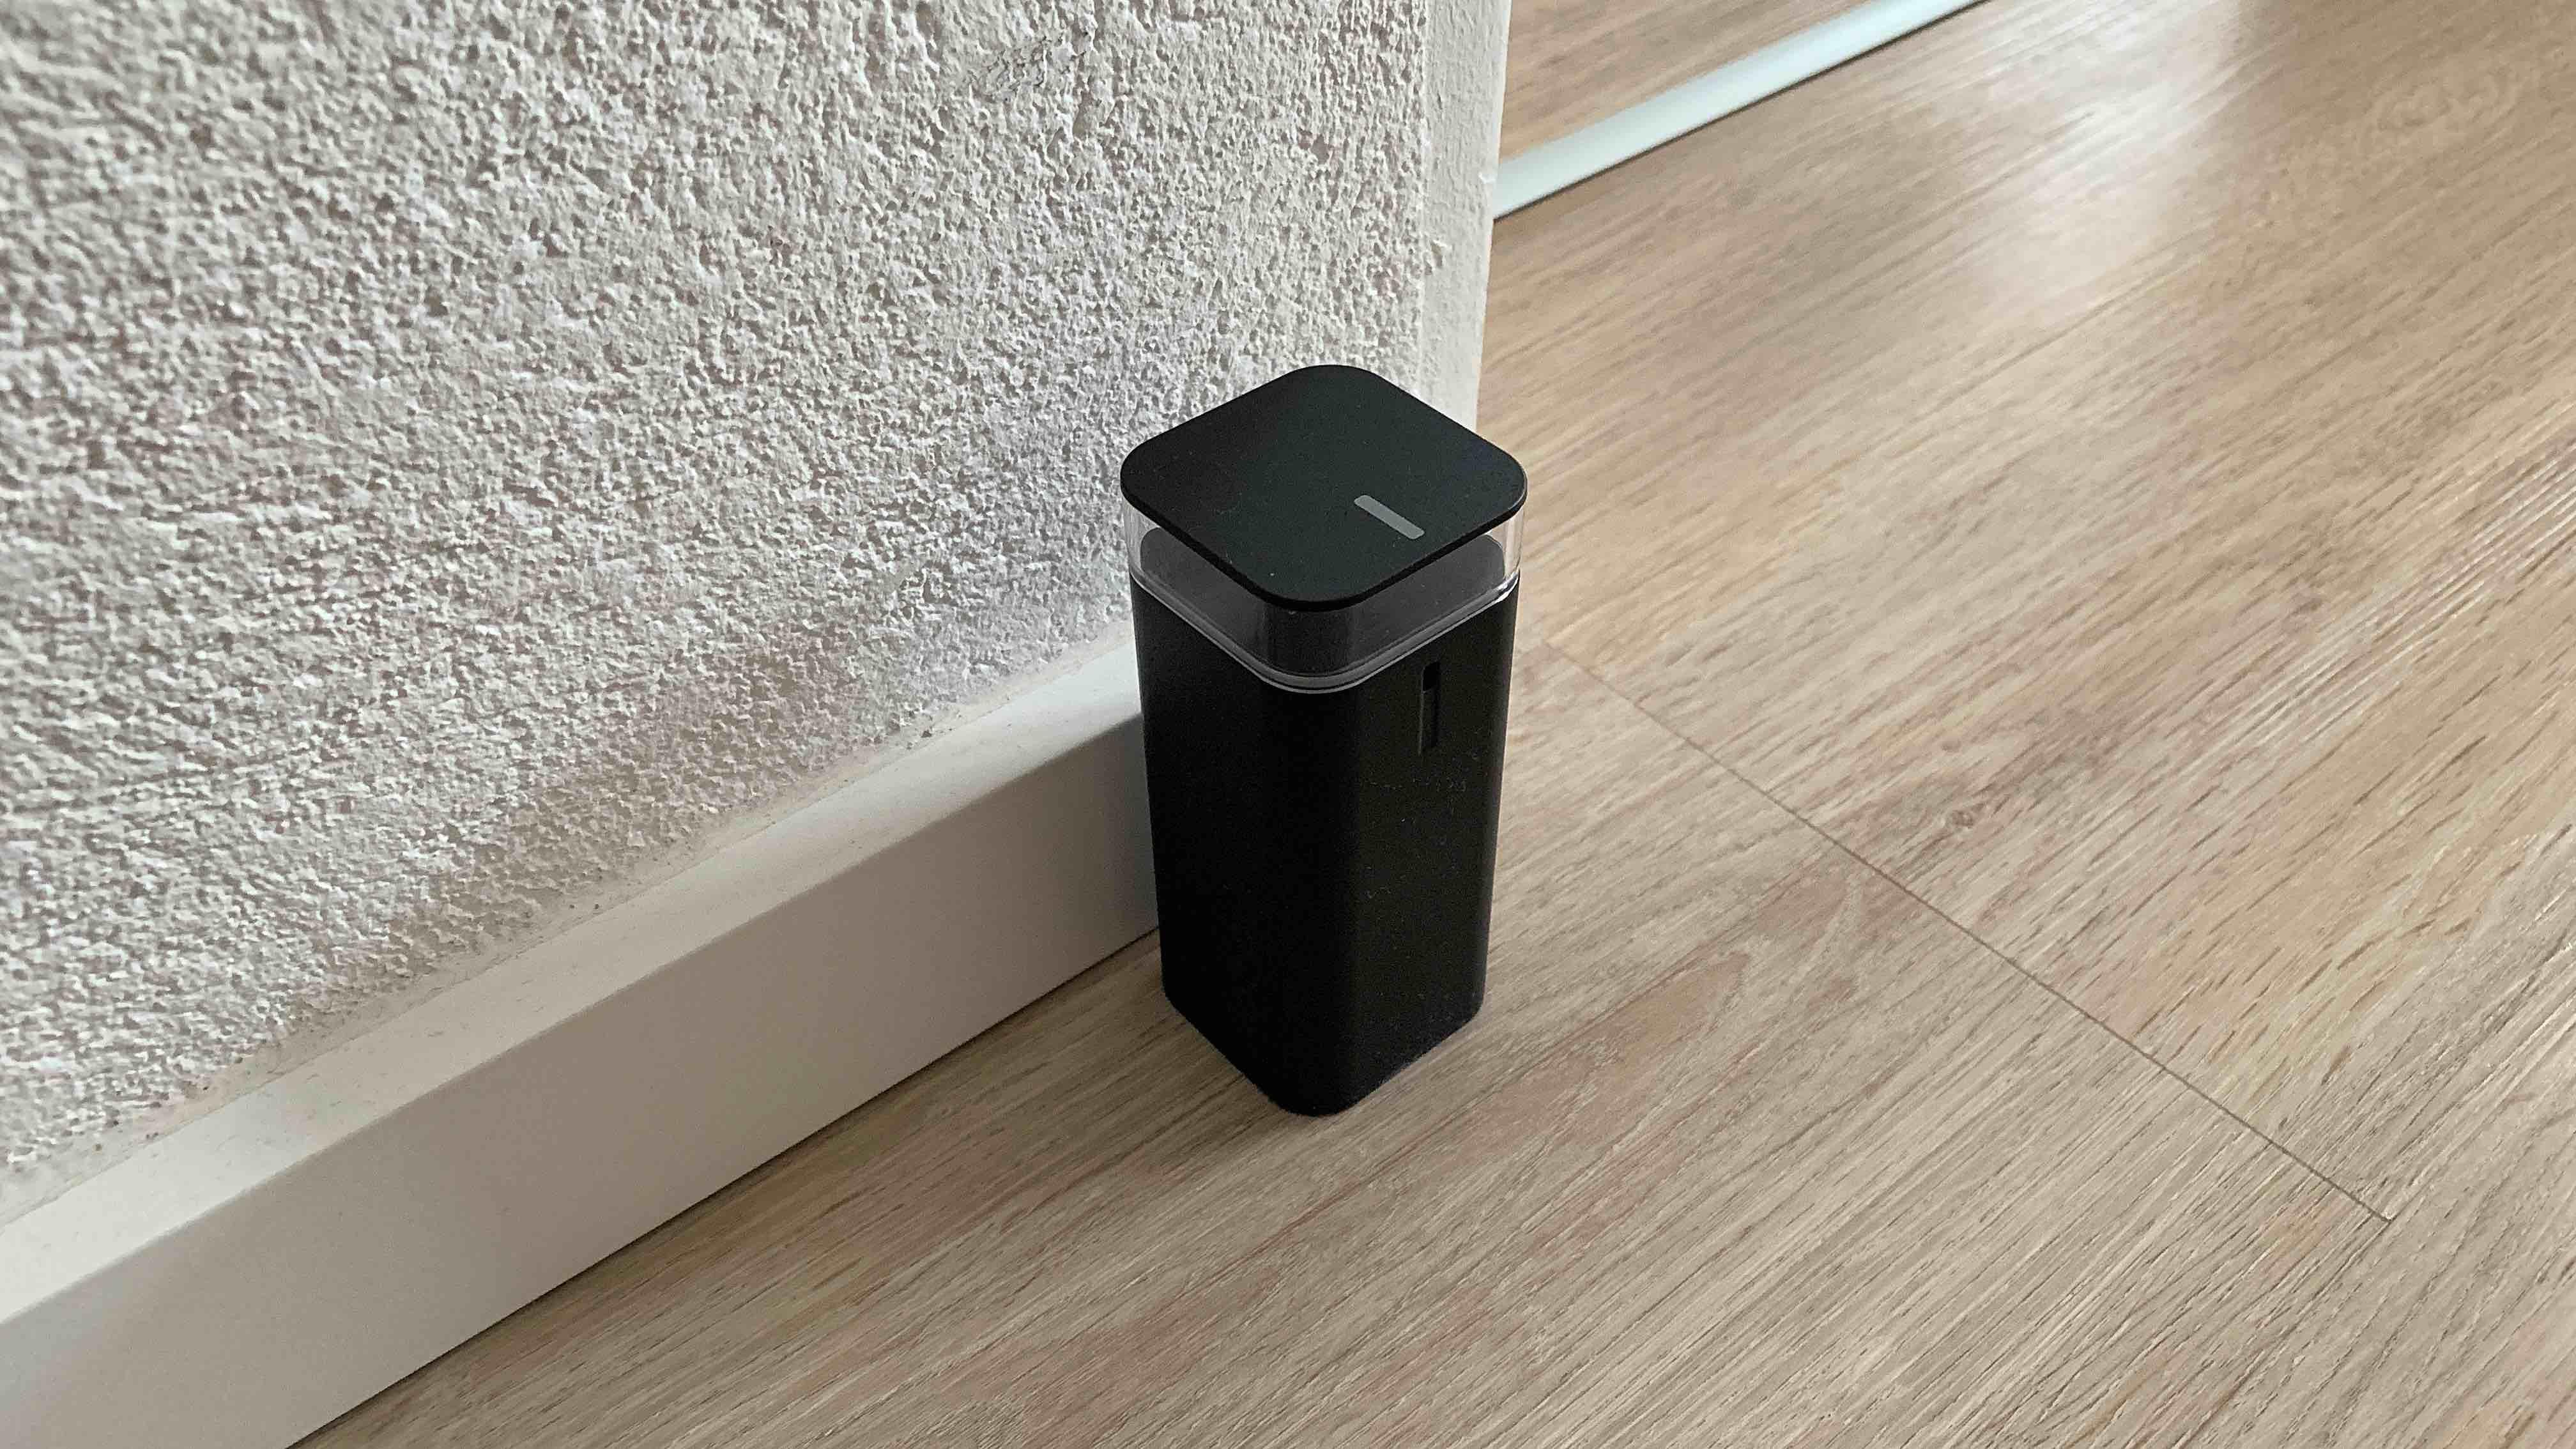 iRobot_Roomba_980_Roboter_SmartHome_Review2 iRobot Roomba 980 - intelligent, zuverlässig und akkurat das Heim saugen lassen